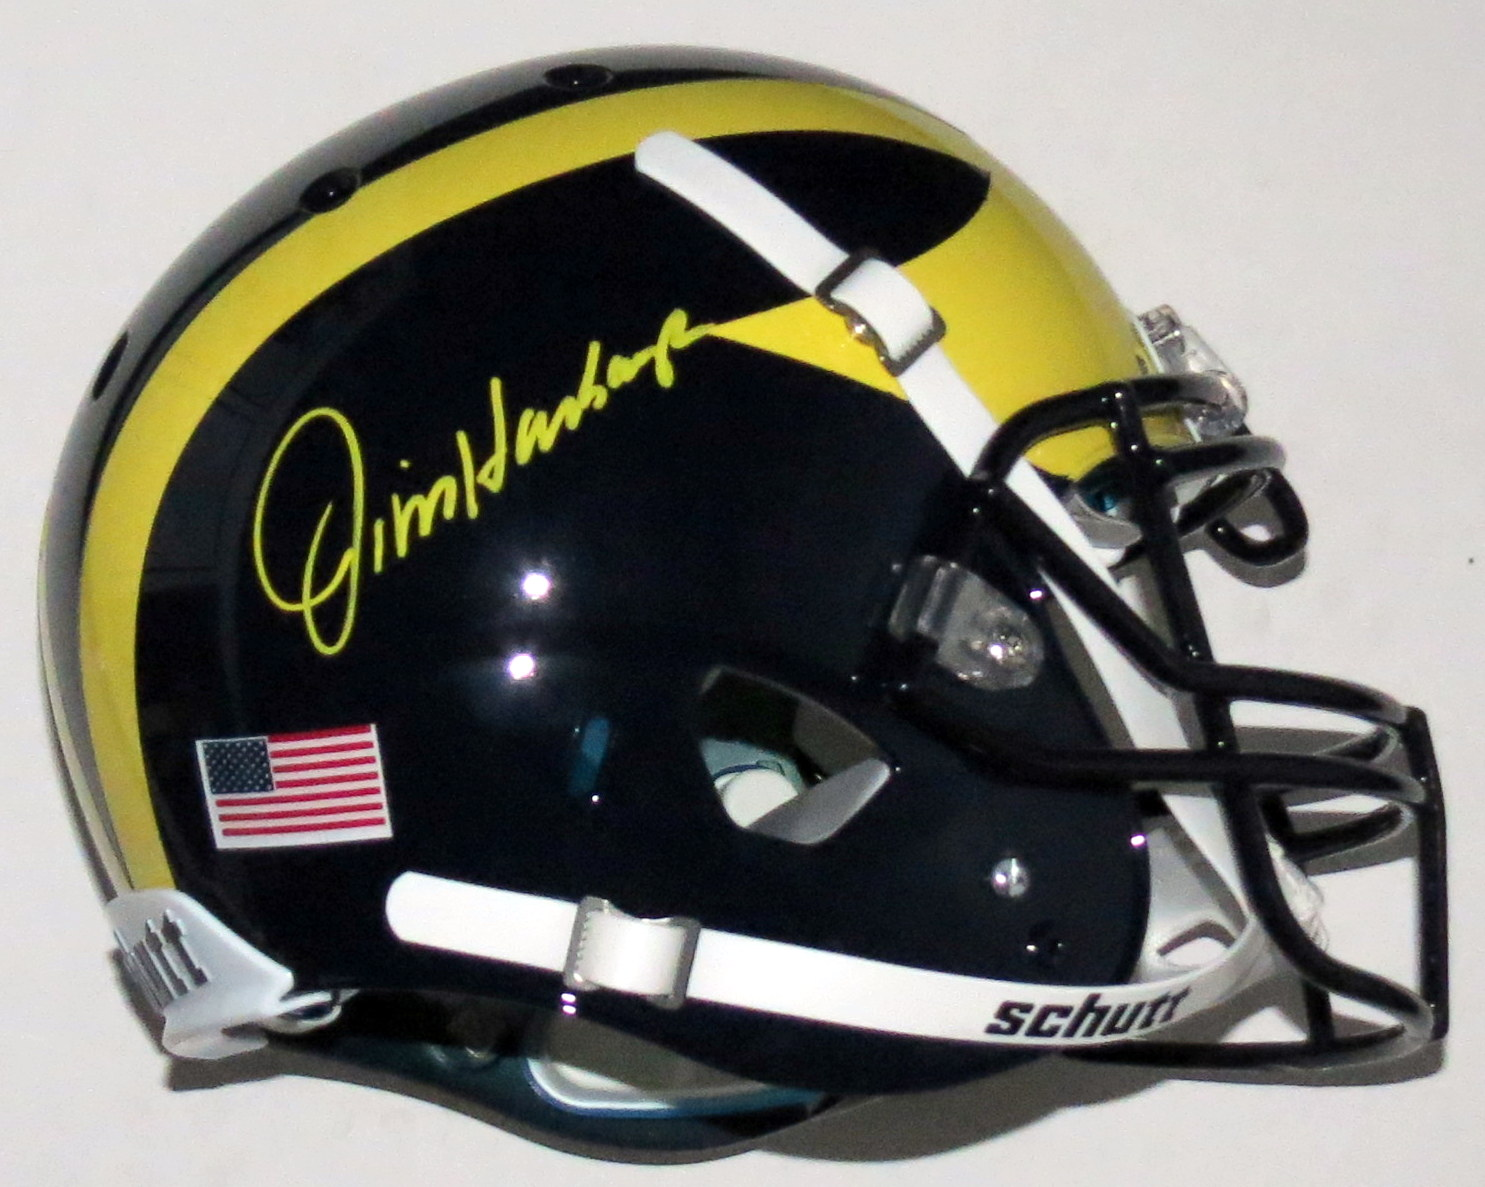 Jim Harbaugh Signed Michigan Wolverines Authentic Schutt Full Size Helmet - Fanatics COA Authenticated